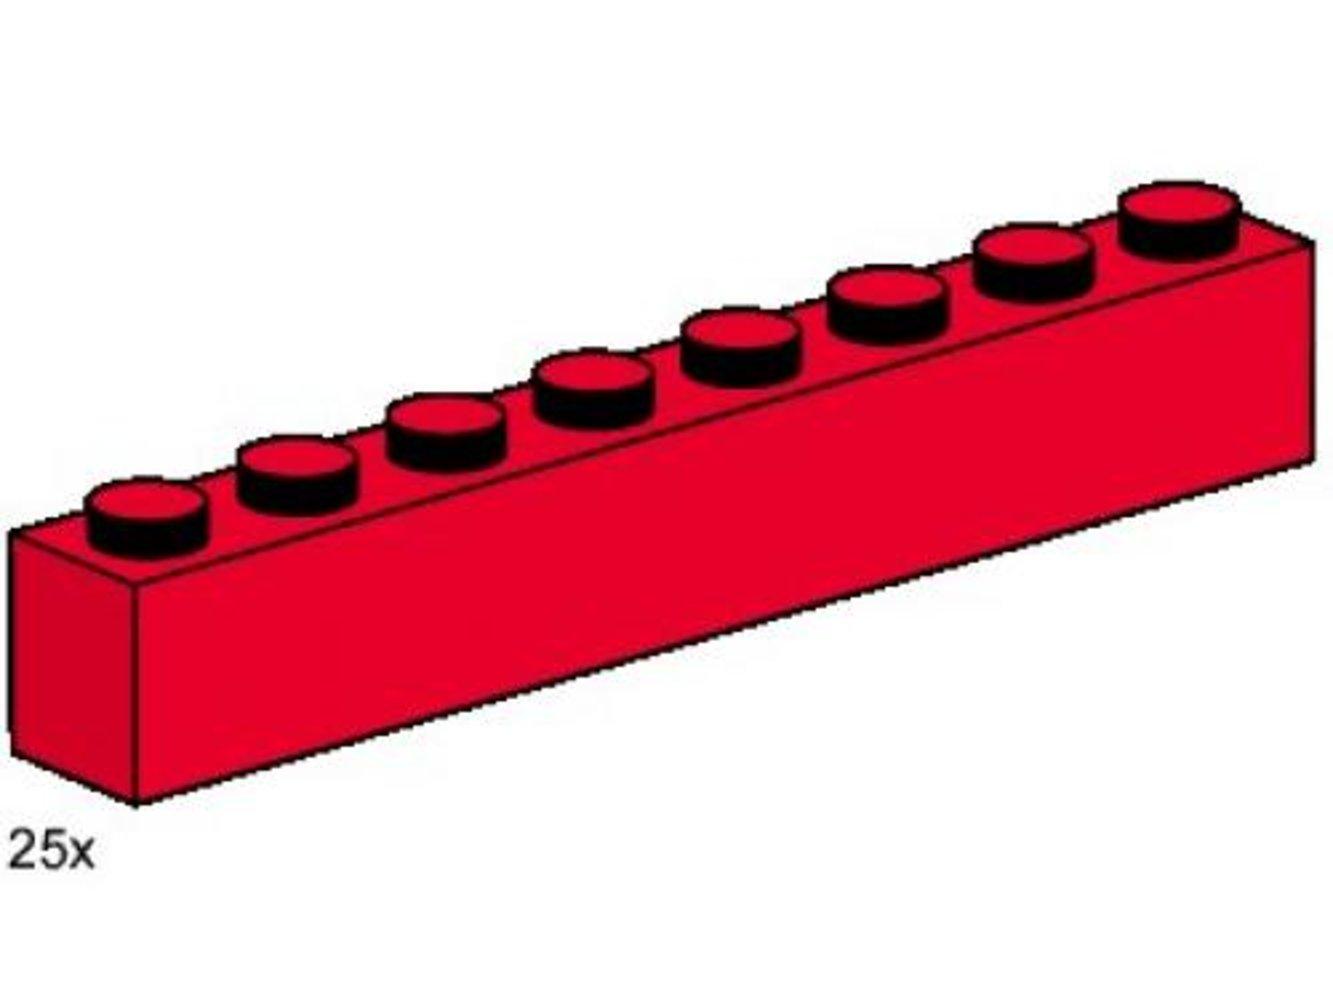 1 x 8 Red Bricks